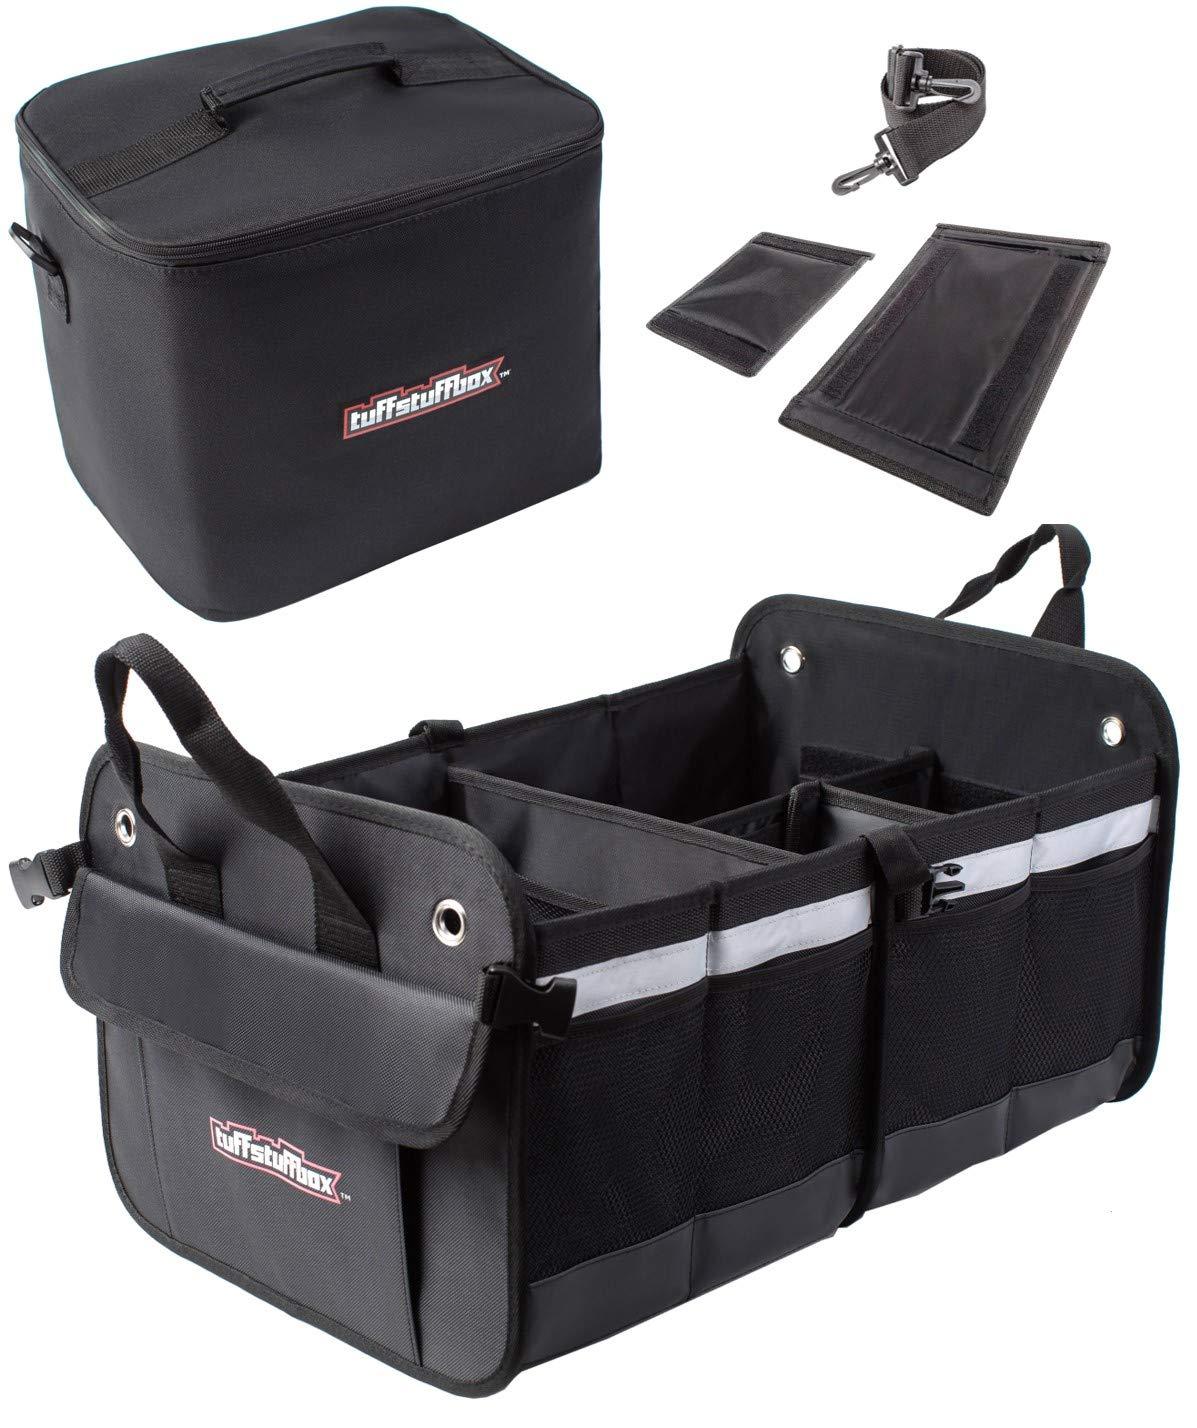 Premium Car Trunk Organizer | Cooler Insulated Leakproof Bag | SUV, Truck Bed Storage Accessories | Back seat Organizers | Car Accessories for Women | Automotive Stuff Tuff Stuff Box TSB001